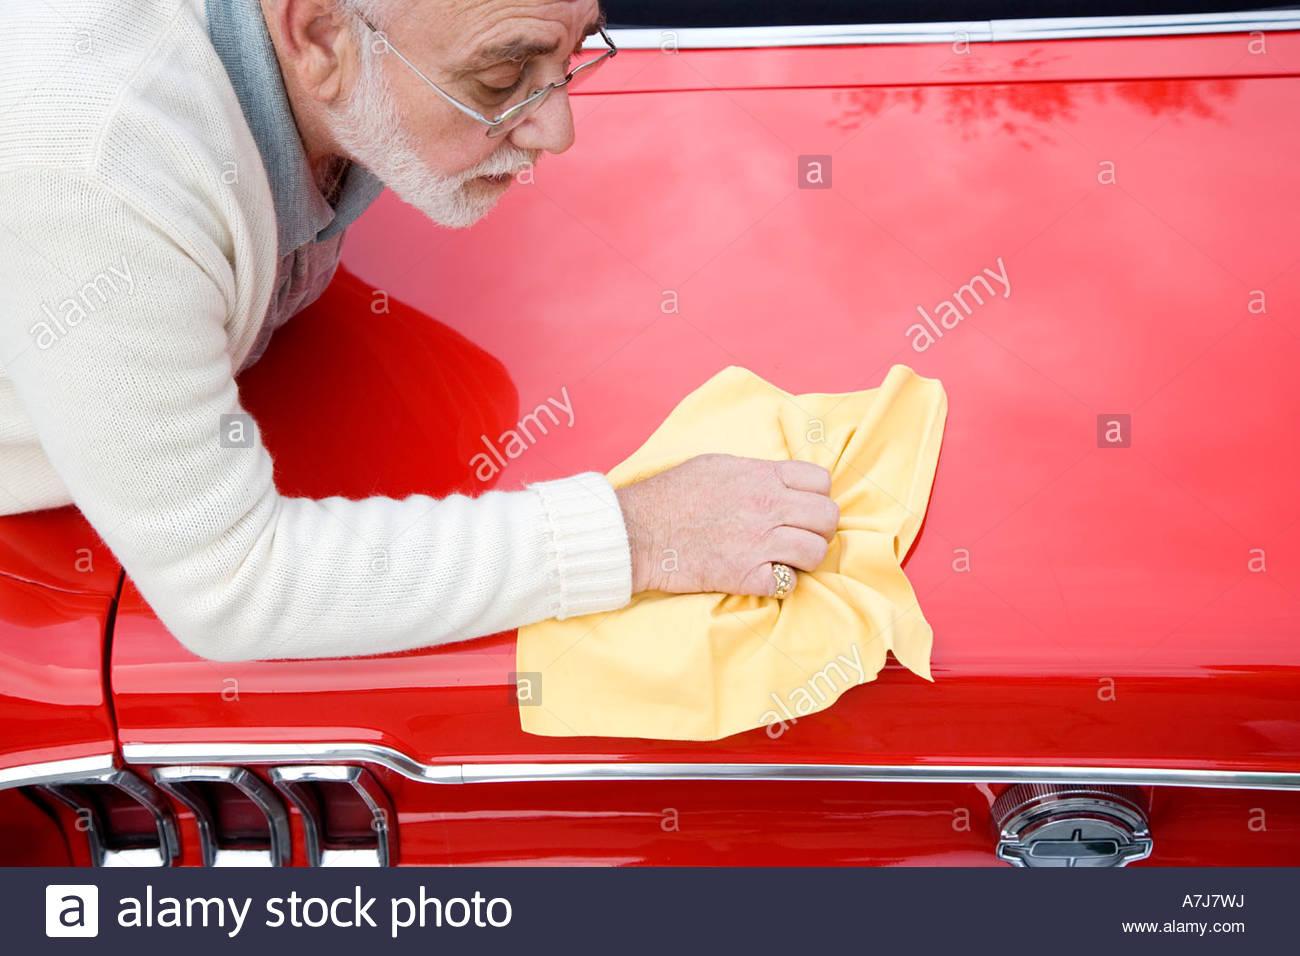 A senior man polishing a sports car - Stock Image